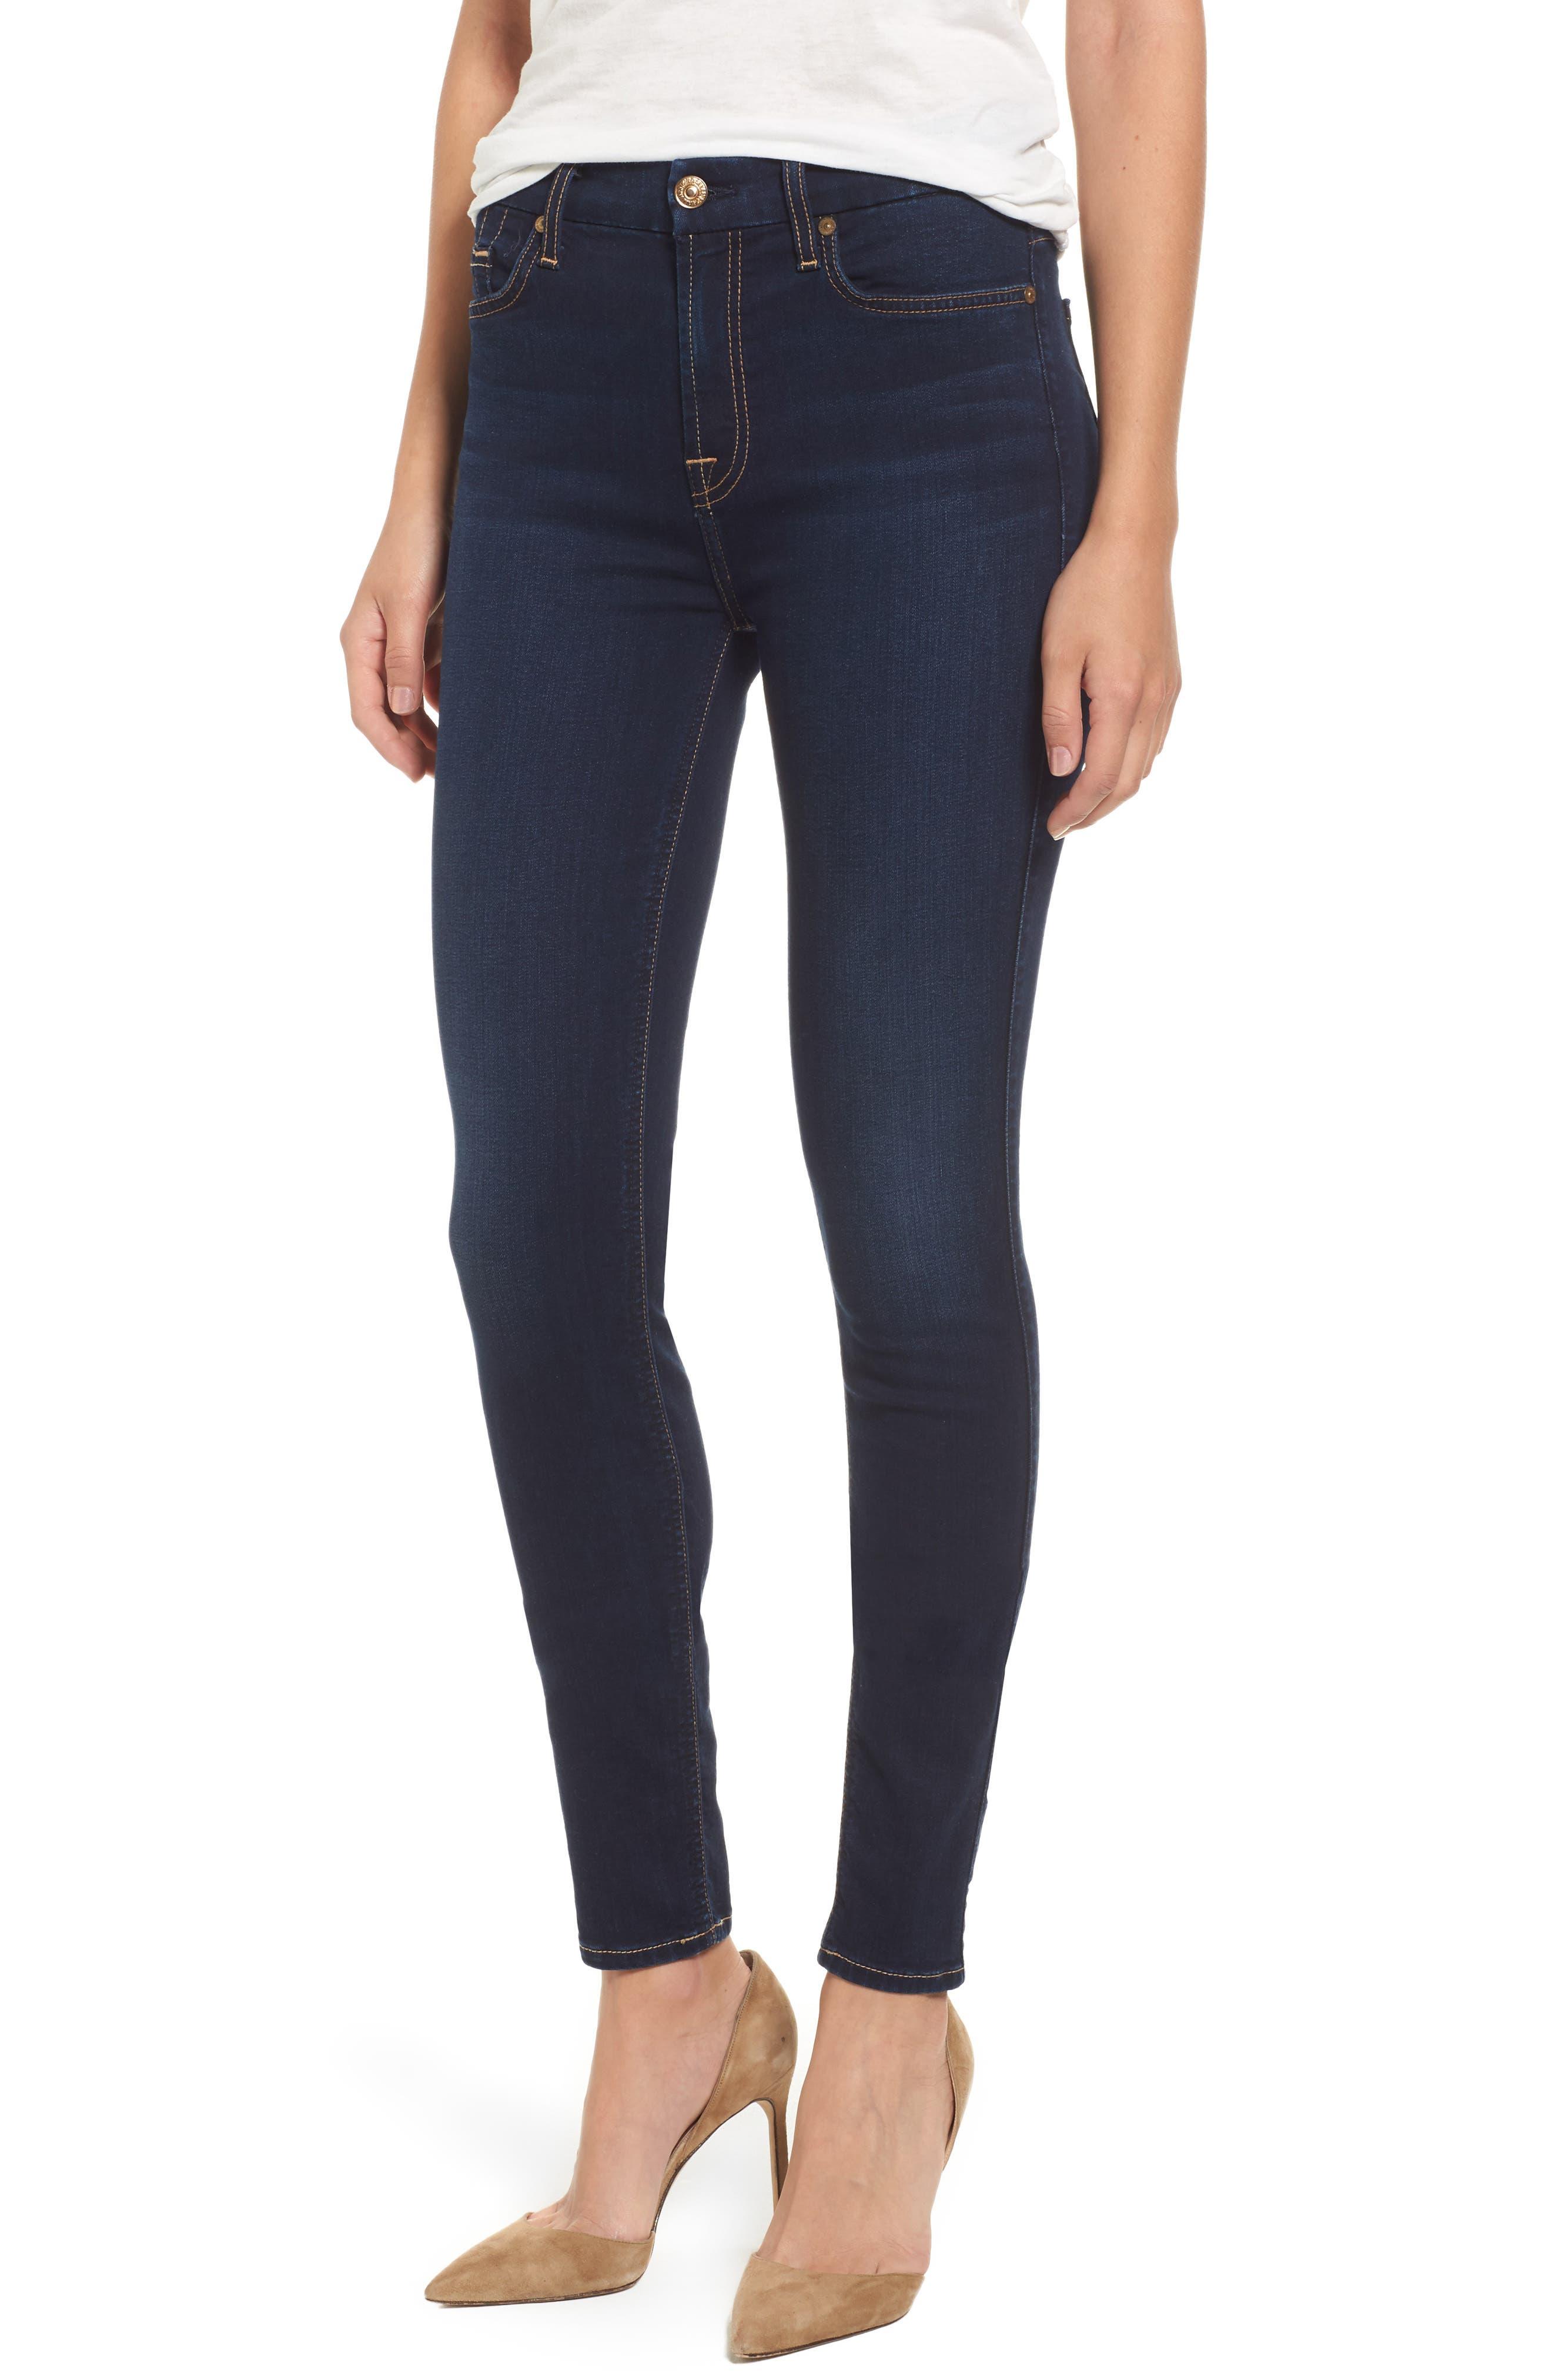 b(air) High Waist Skinny Jeans,                         Main,                         color, 400